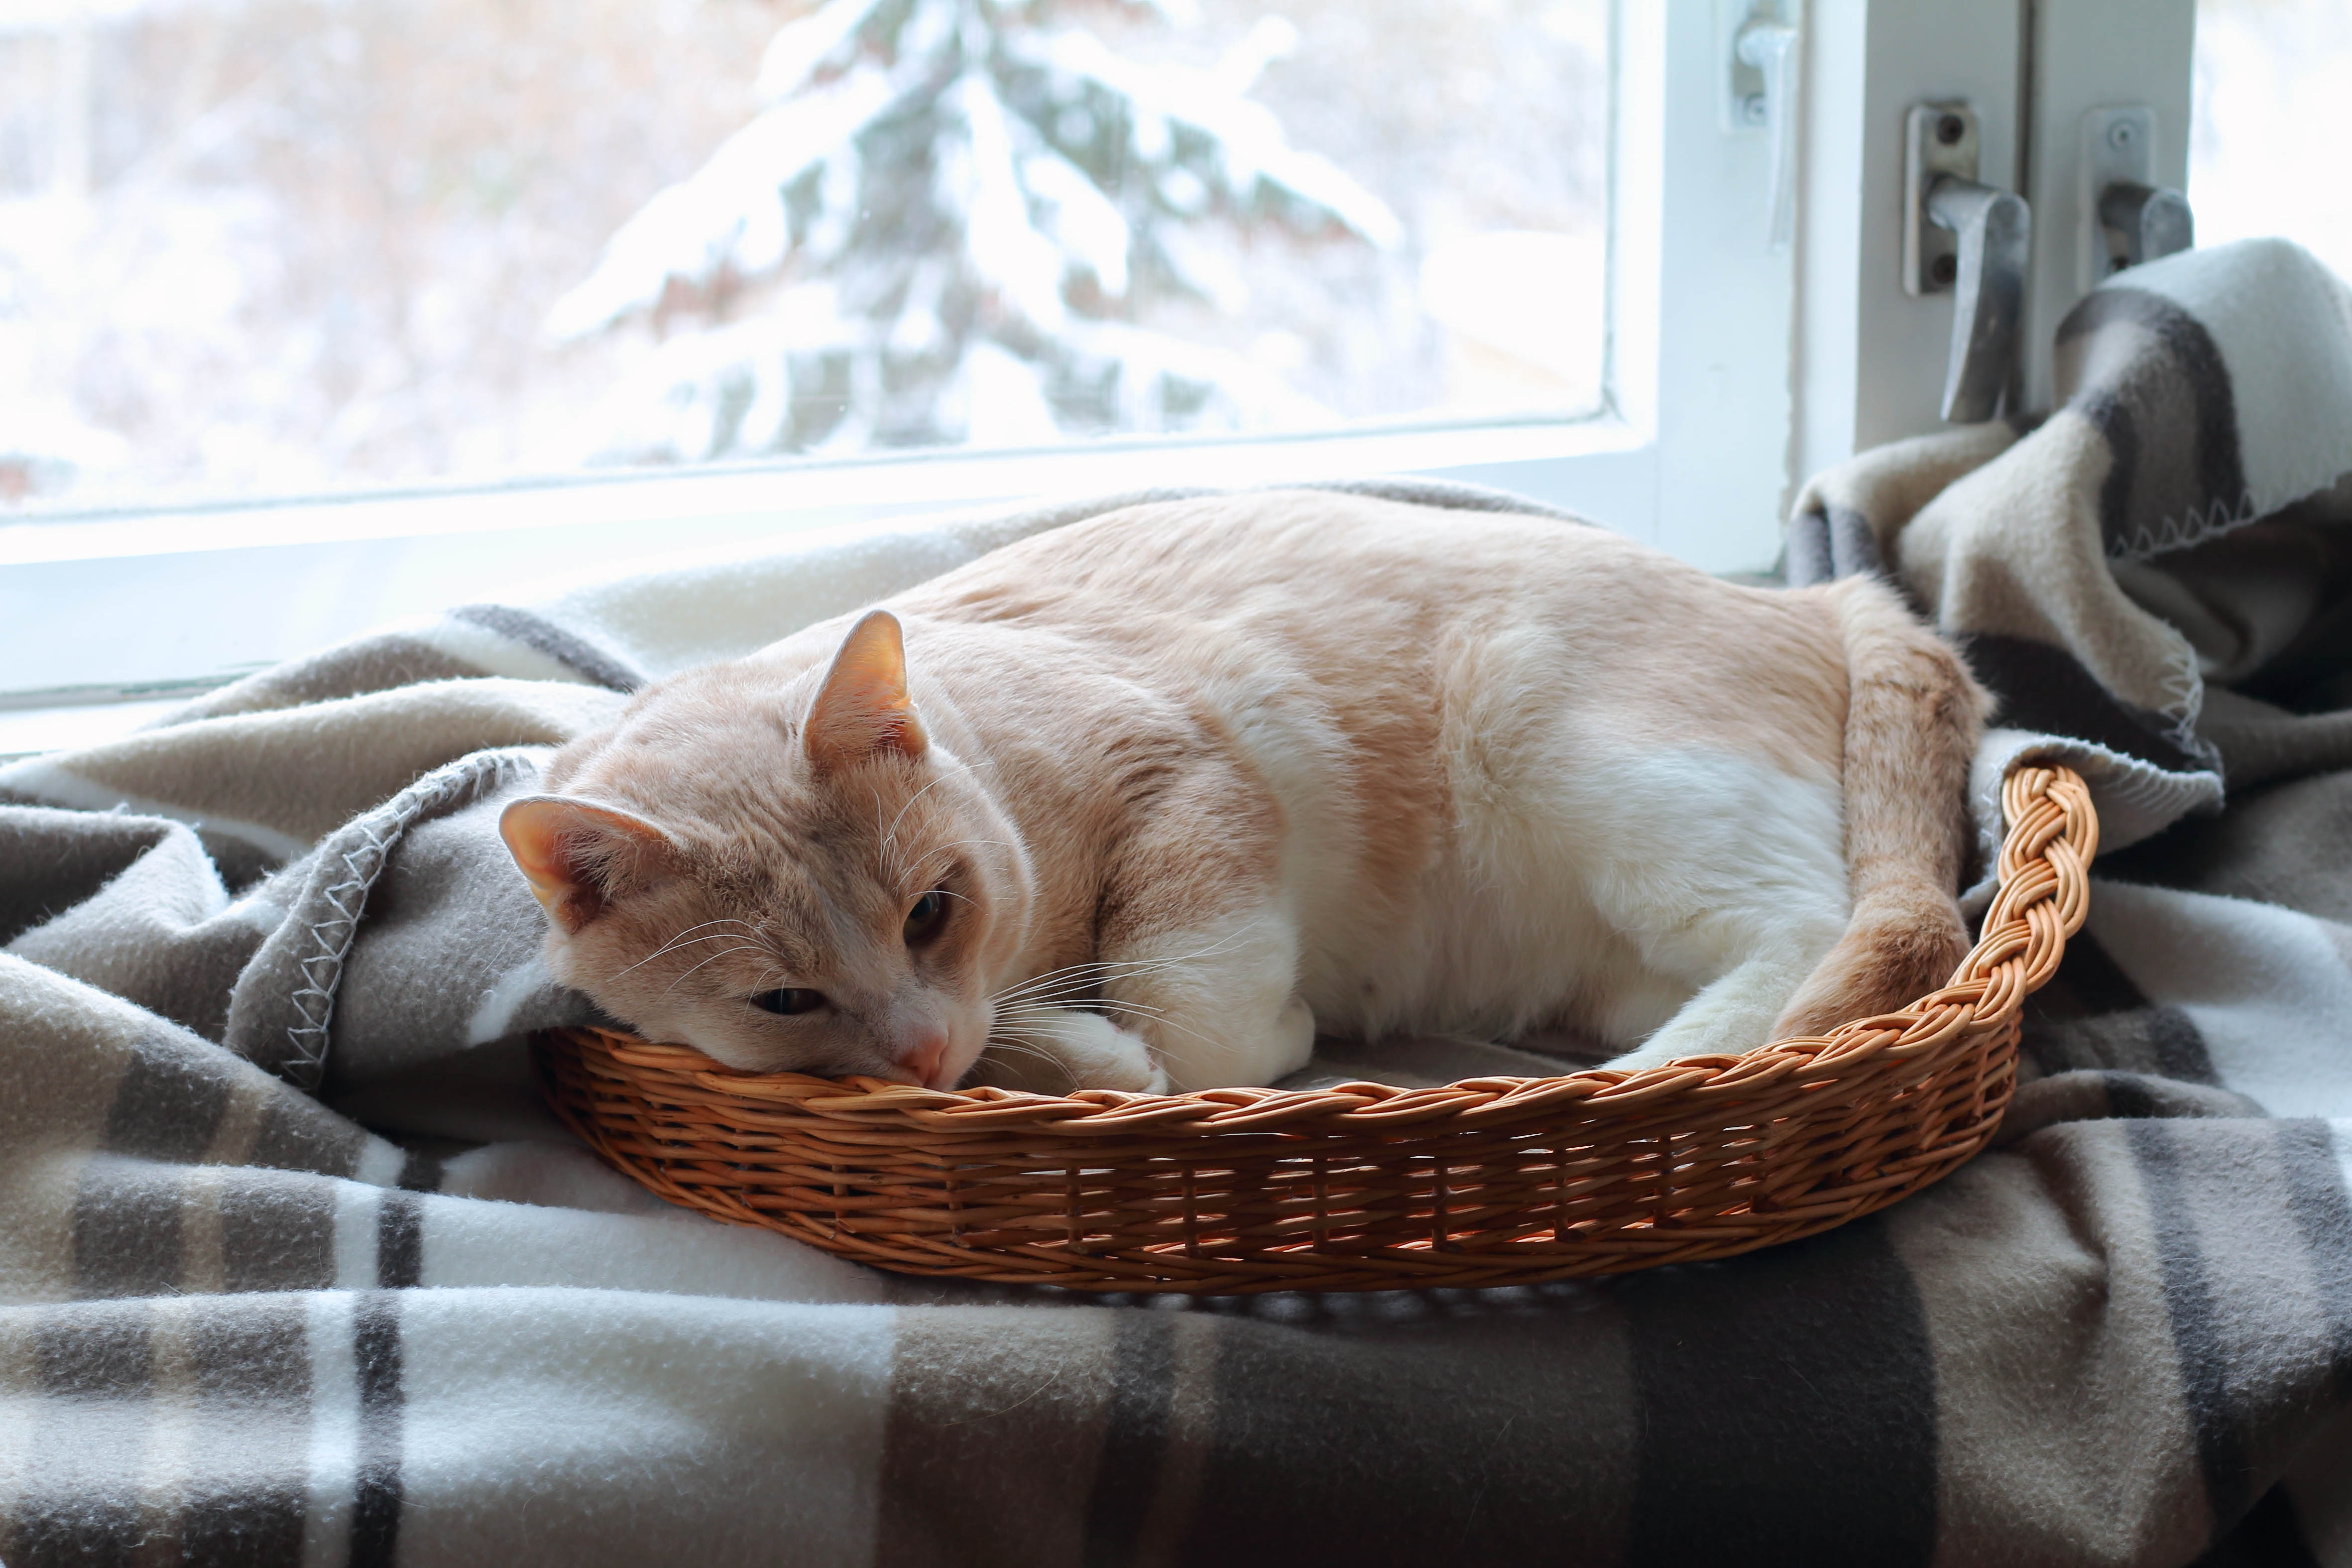 Katze in Korb vor Fenster